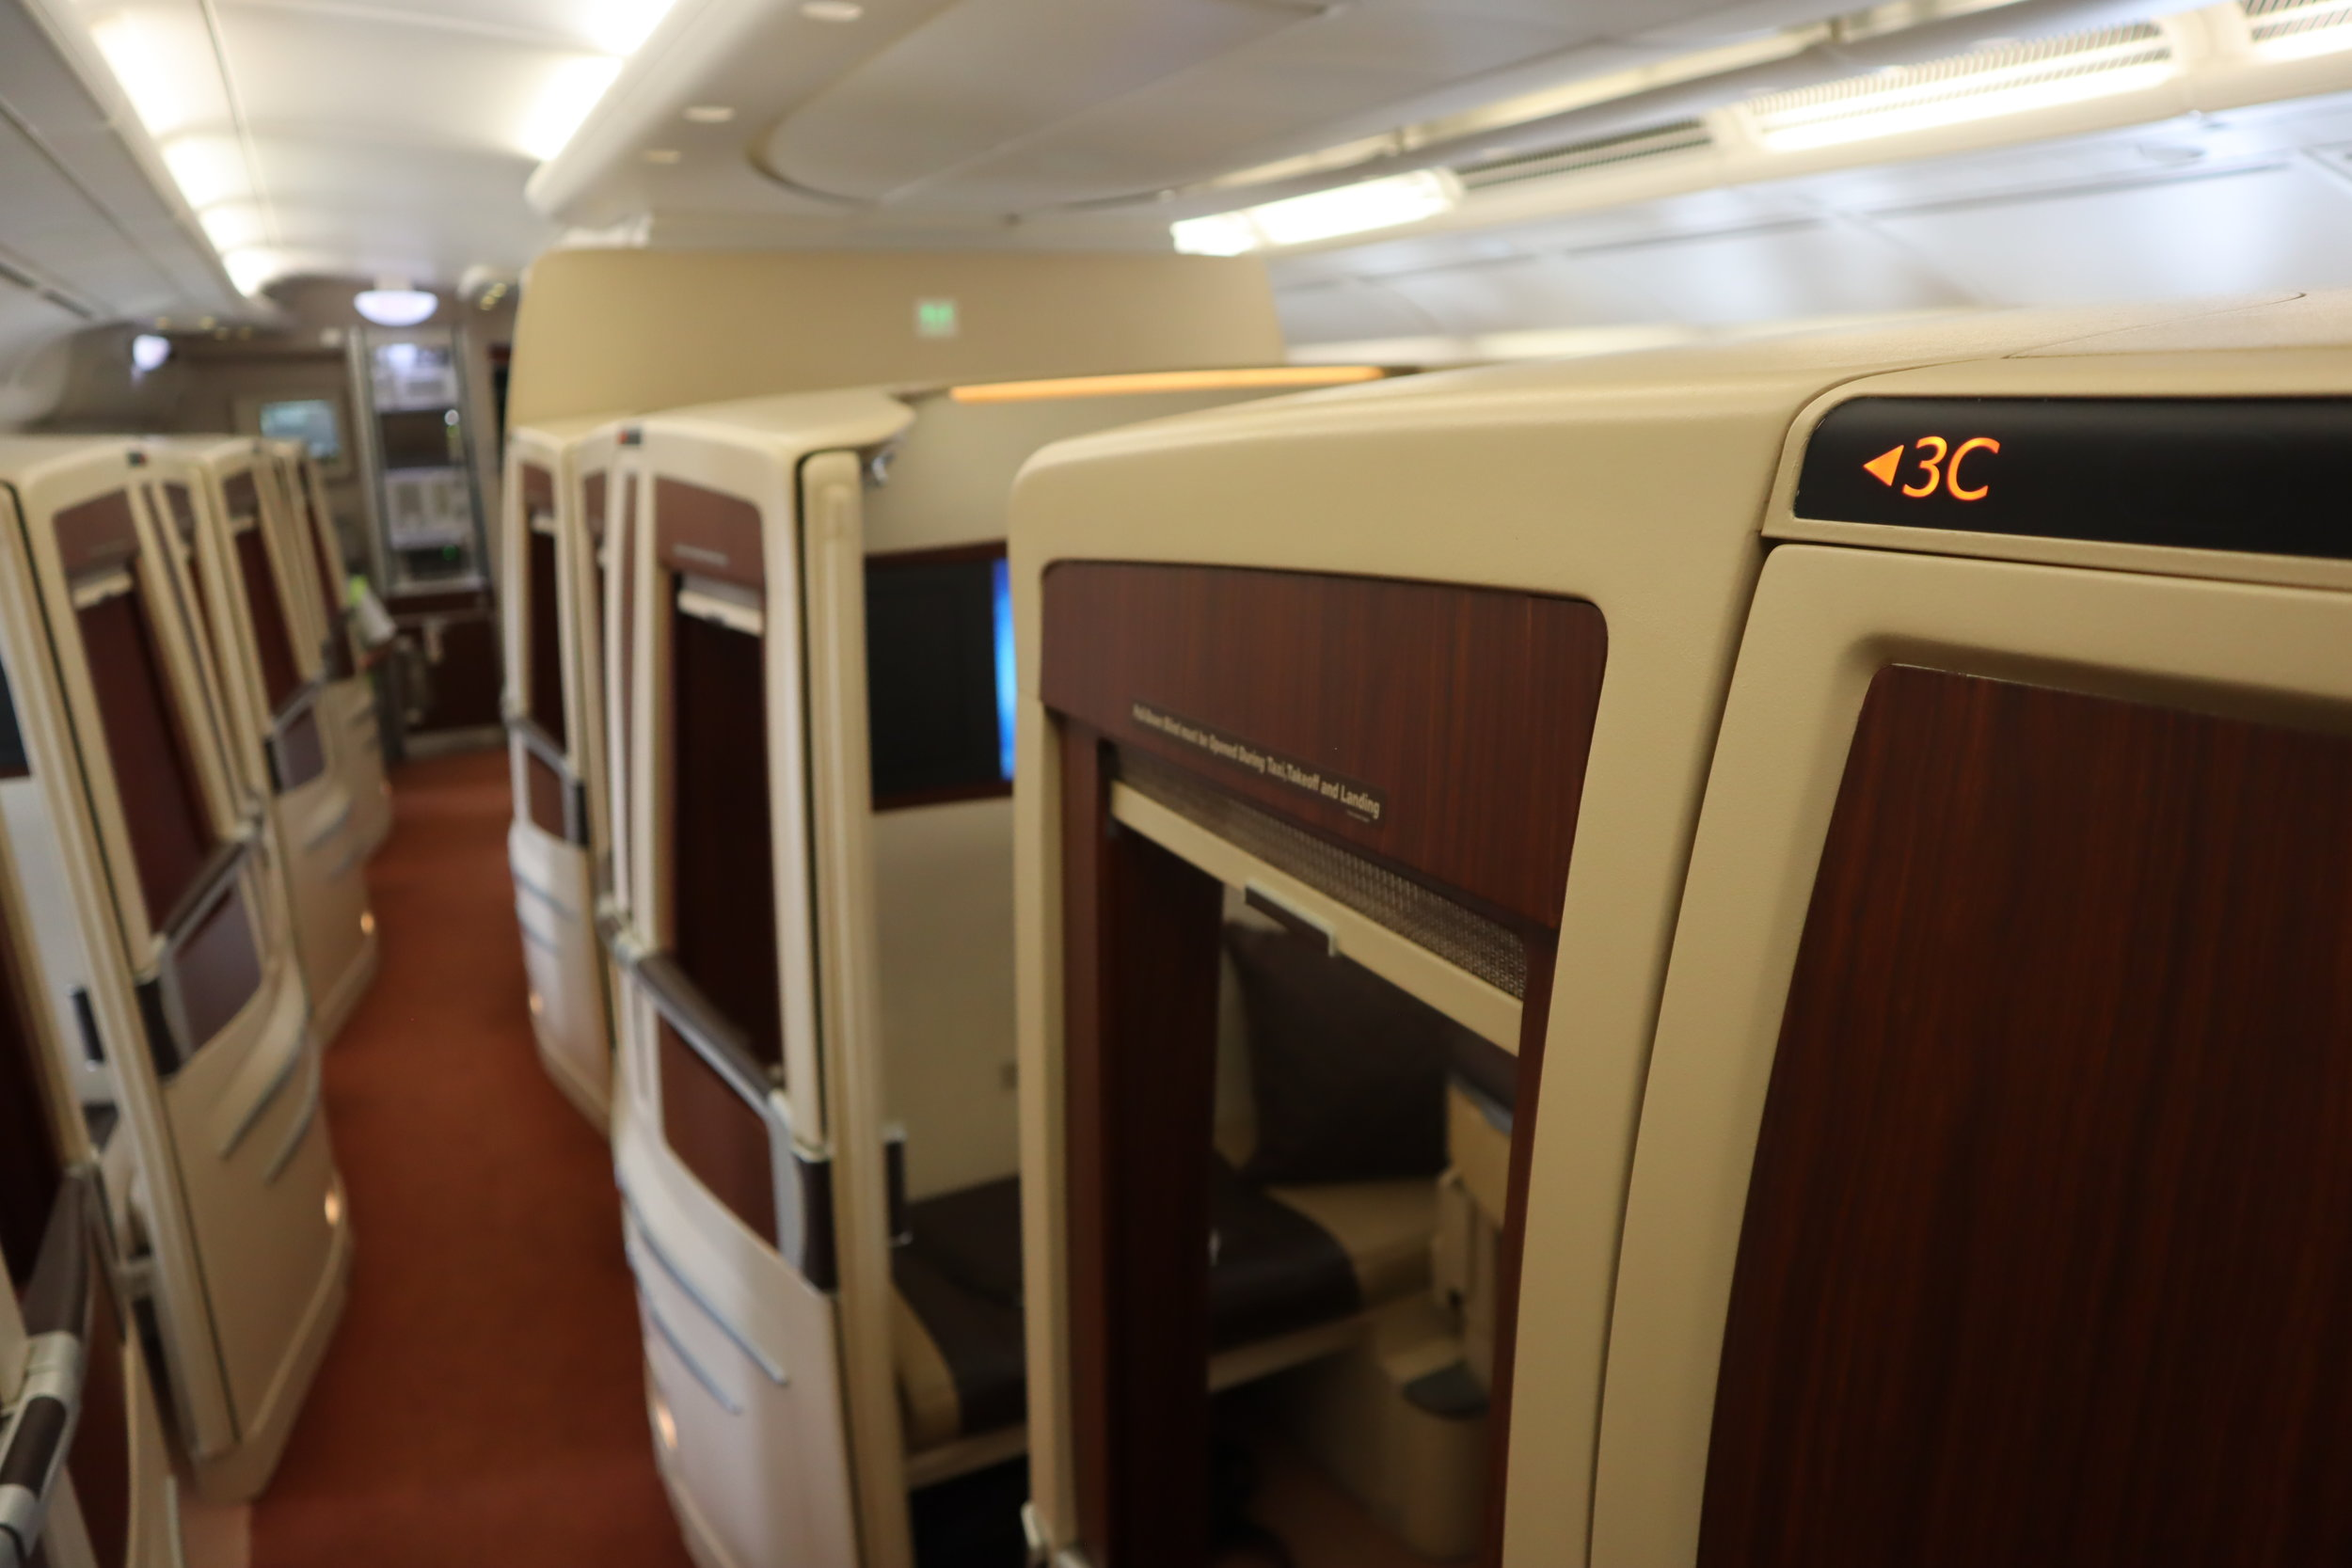 Singapore Airlines Suites Class – Seat 3C